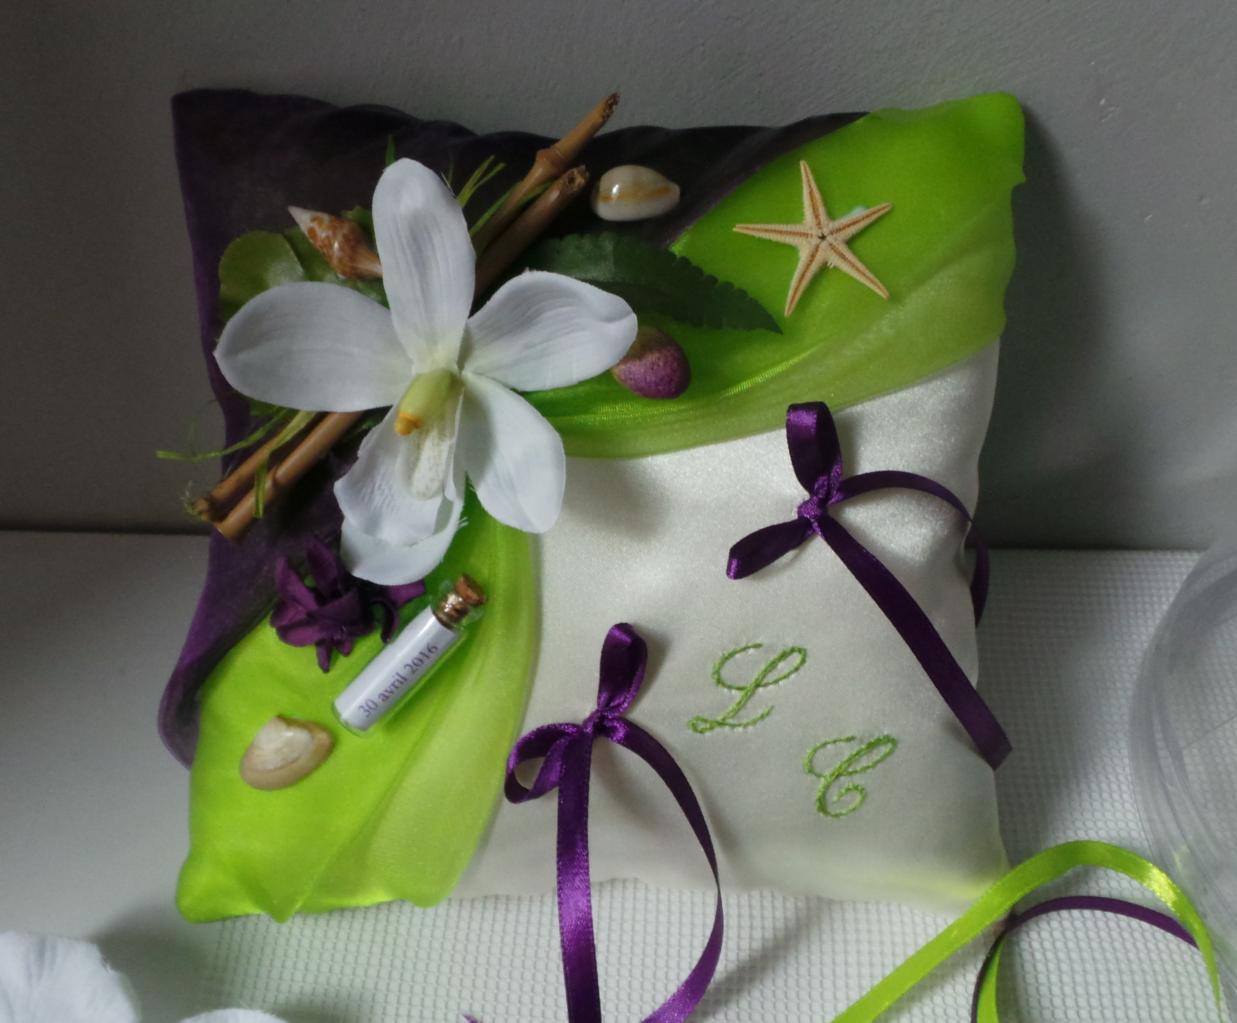 coussin alliances vert vert anis vert pomme vert d 39 eau. Black Bedroom Furniture Sets. Home Design Ideas